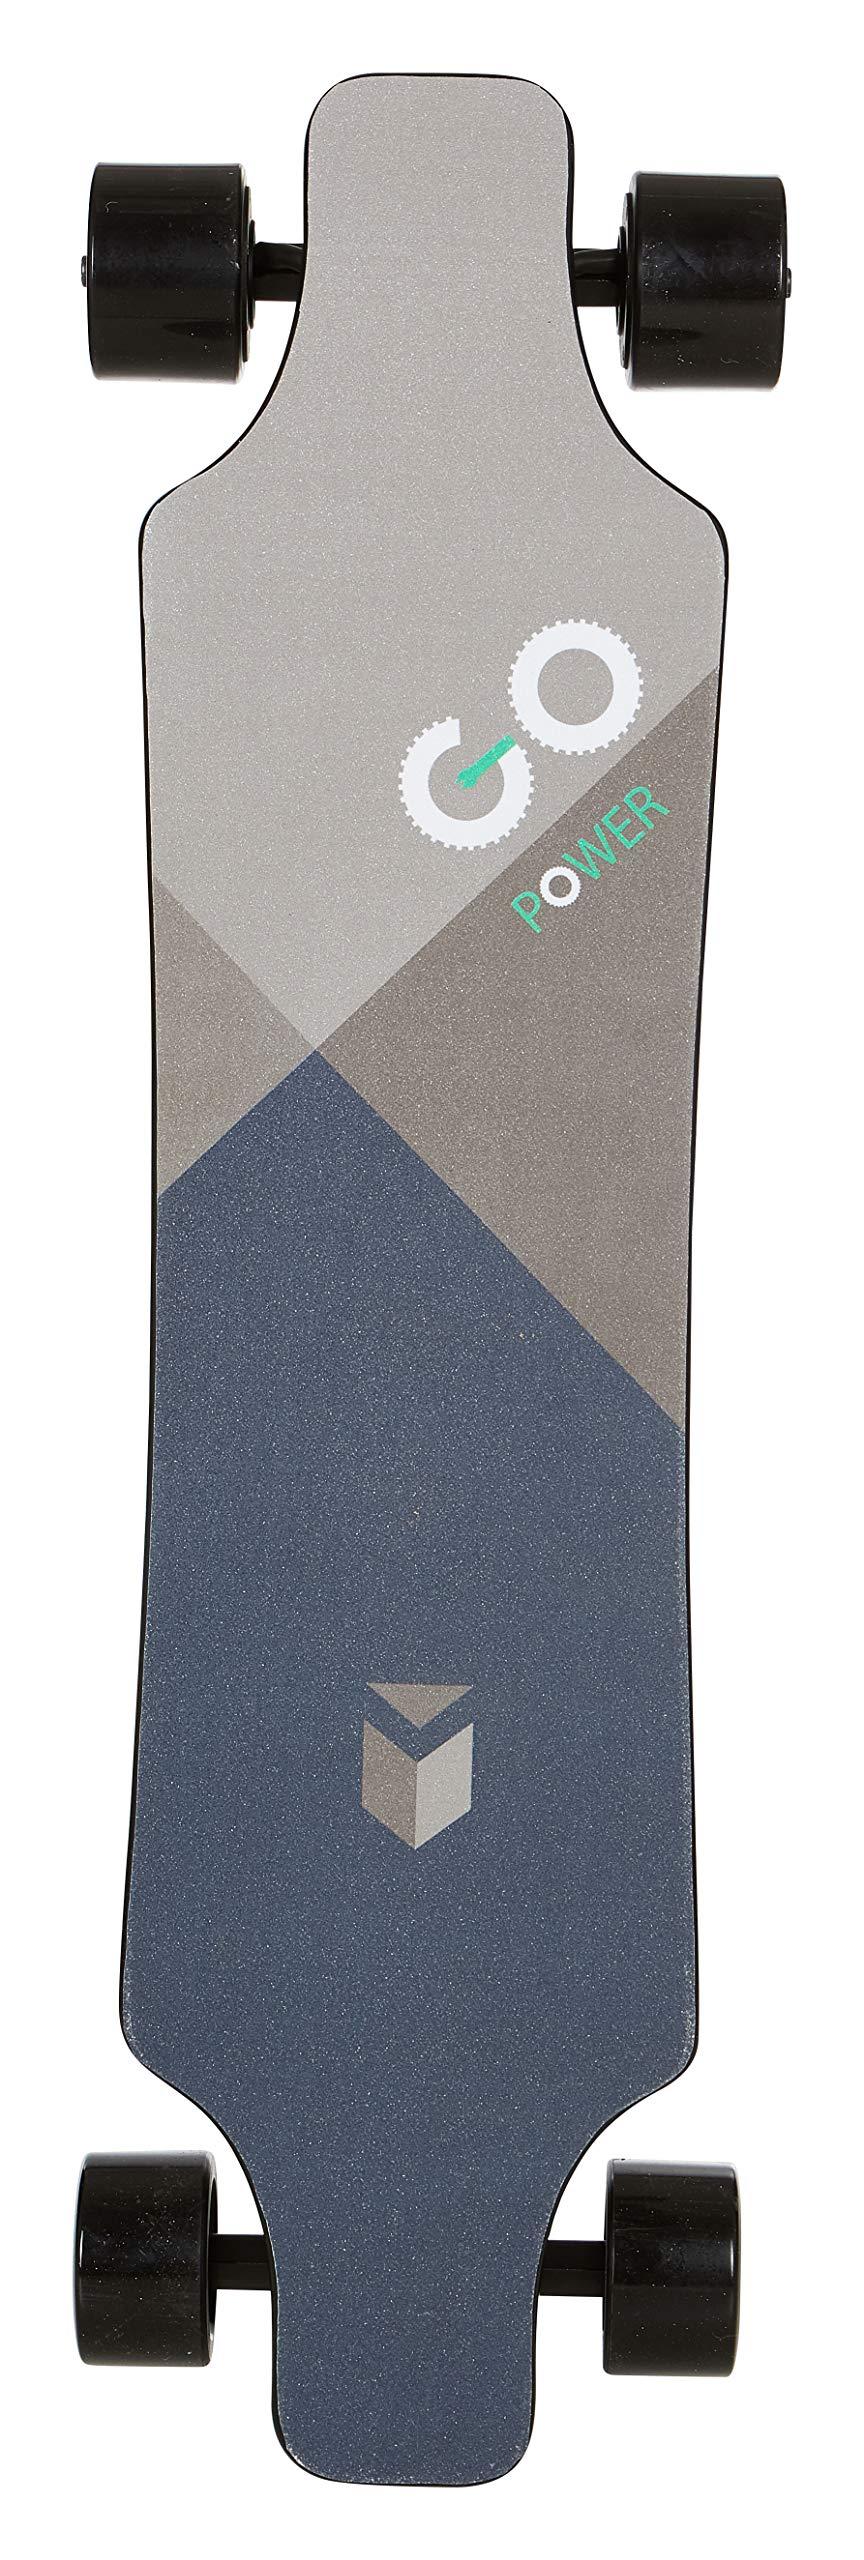 GoPower Boosted Electric Skateboard Eskatesnake